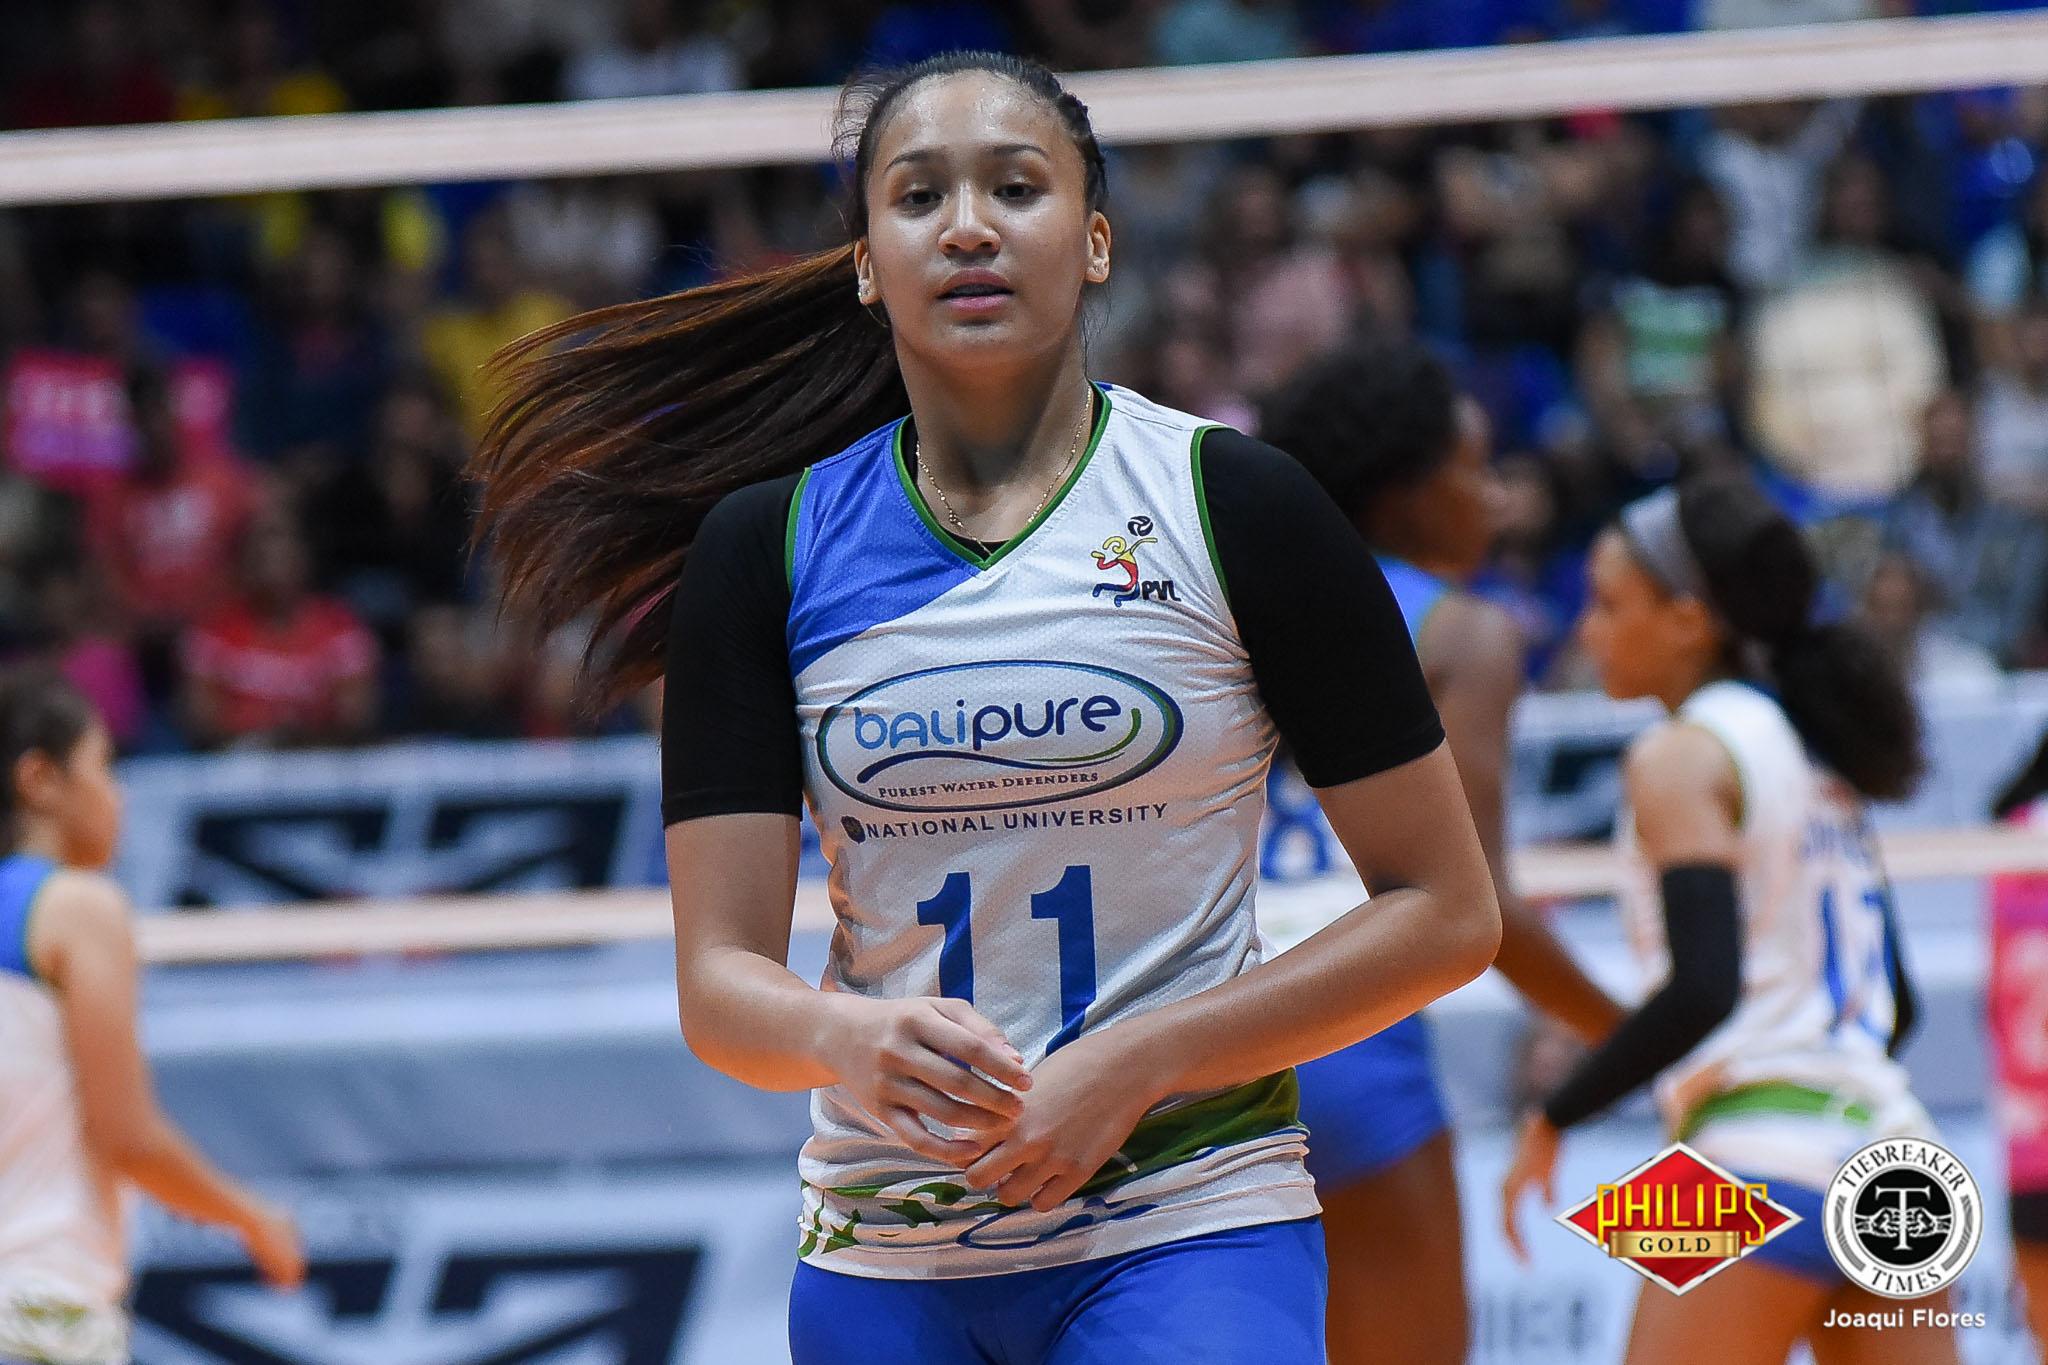 PVL-Reinforced-Creamline-vs.-Balipure-Nisperos-3947 Faith Nisperos seeks academic fulfillment in move to Ateneo ADMU News UAAP Volleyball  - philippine sports news